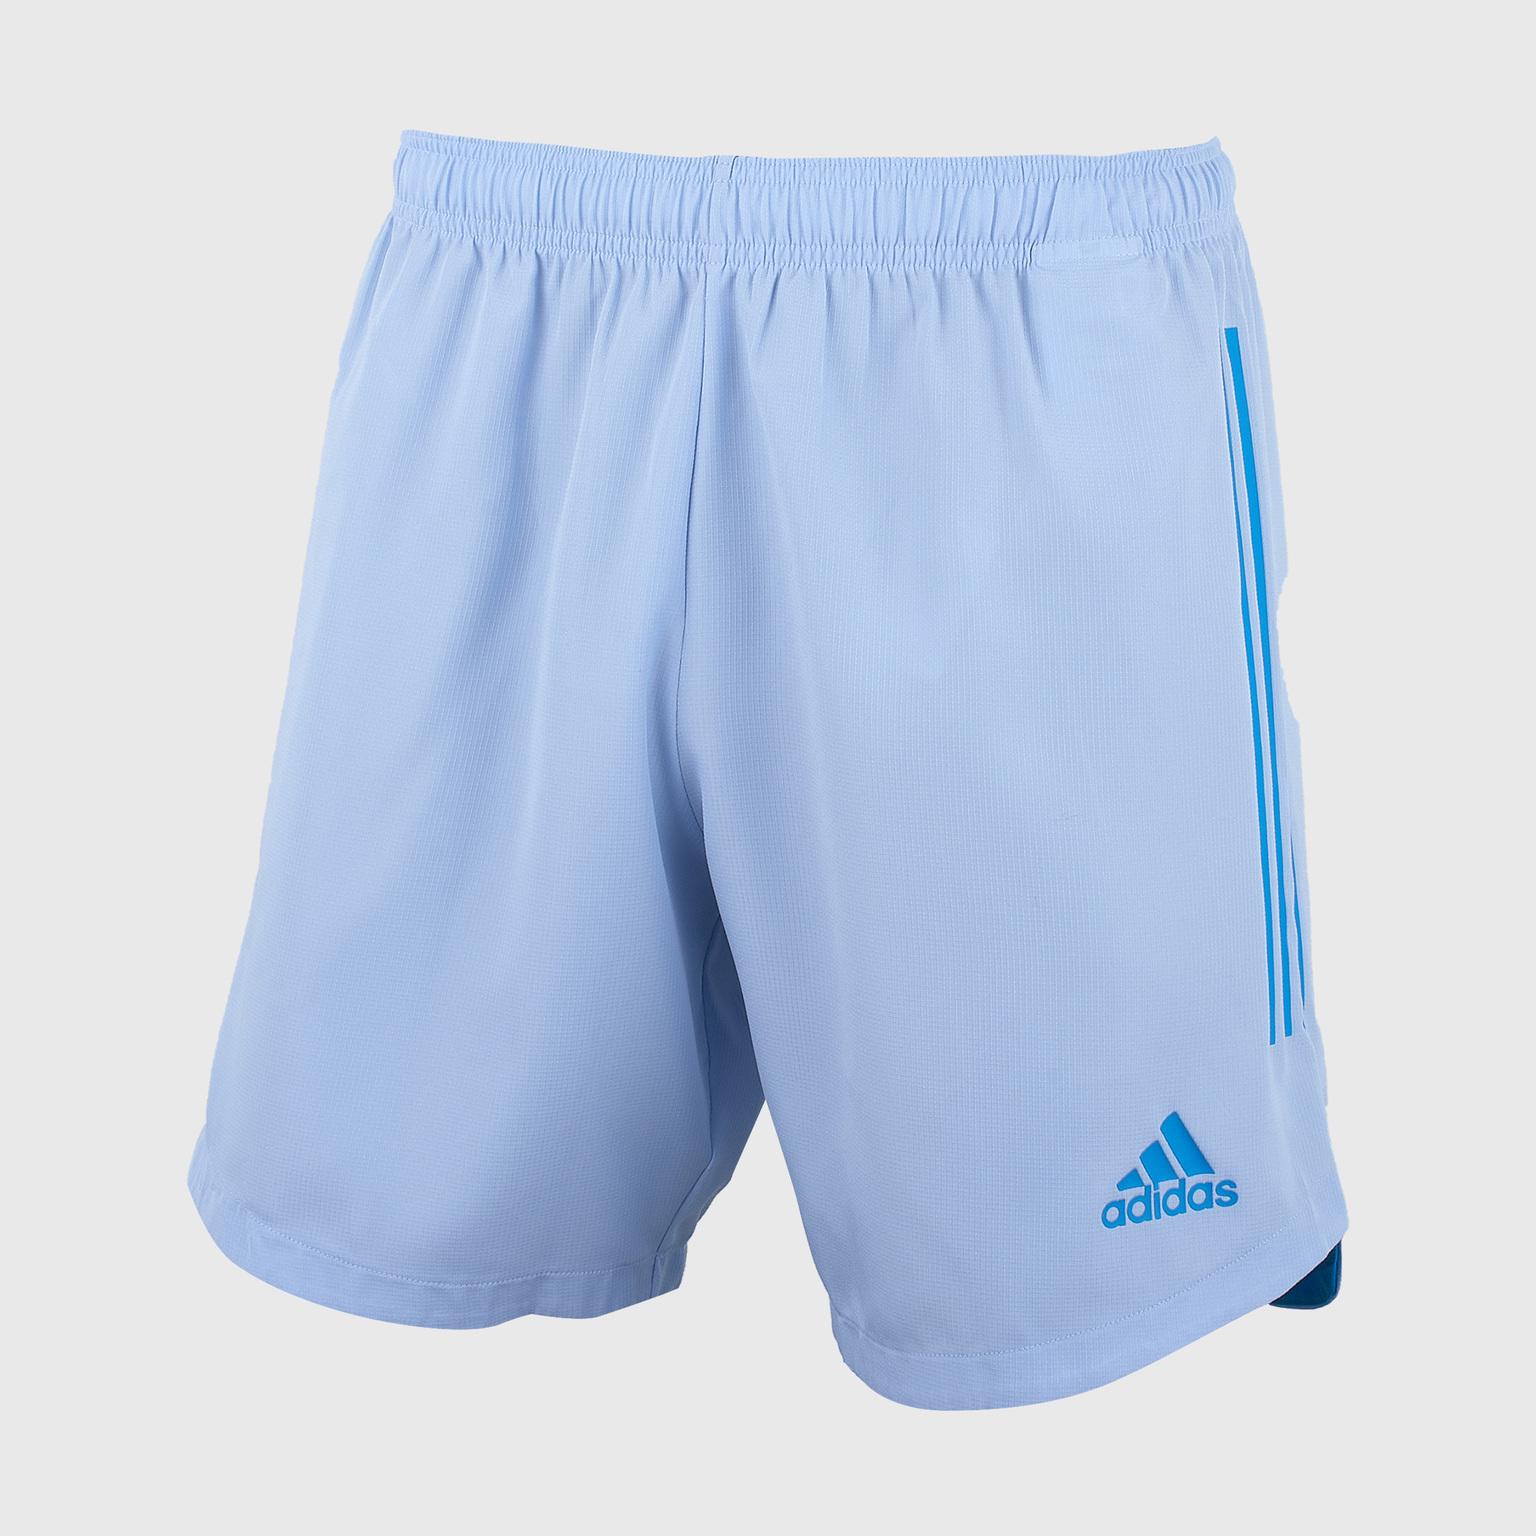 Шорты Adidas Con20 Primeblue FI4219 белье шорты adidas alphaskin sport cw9458